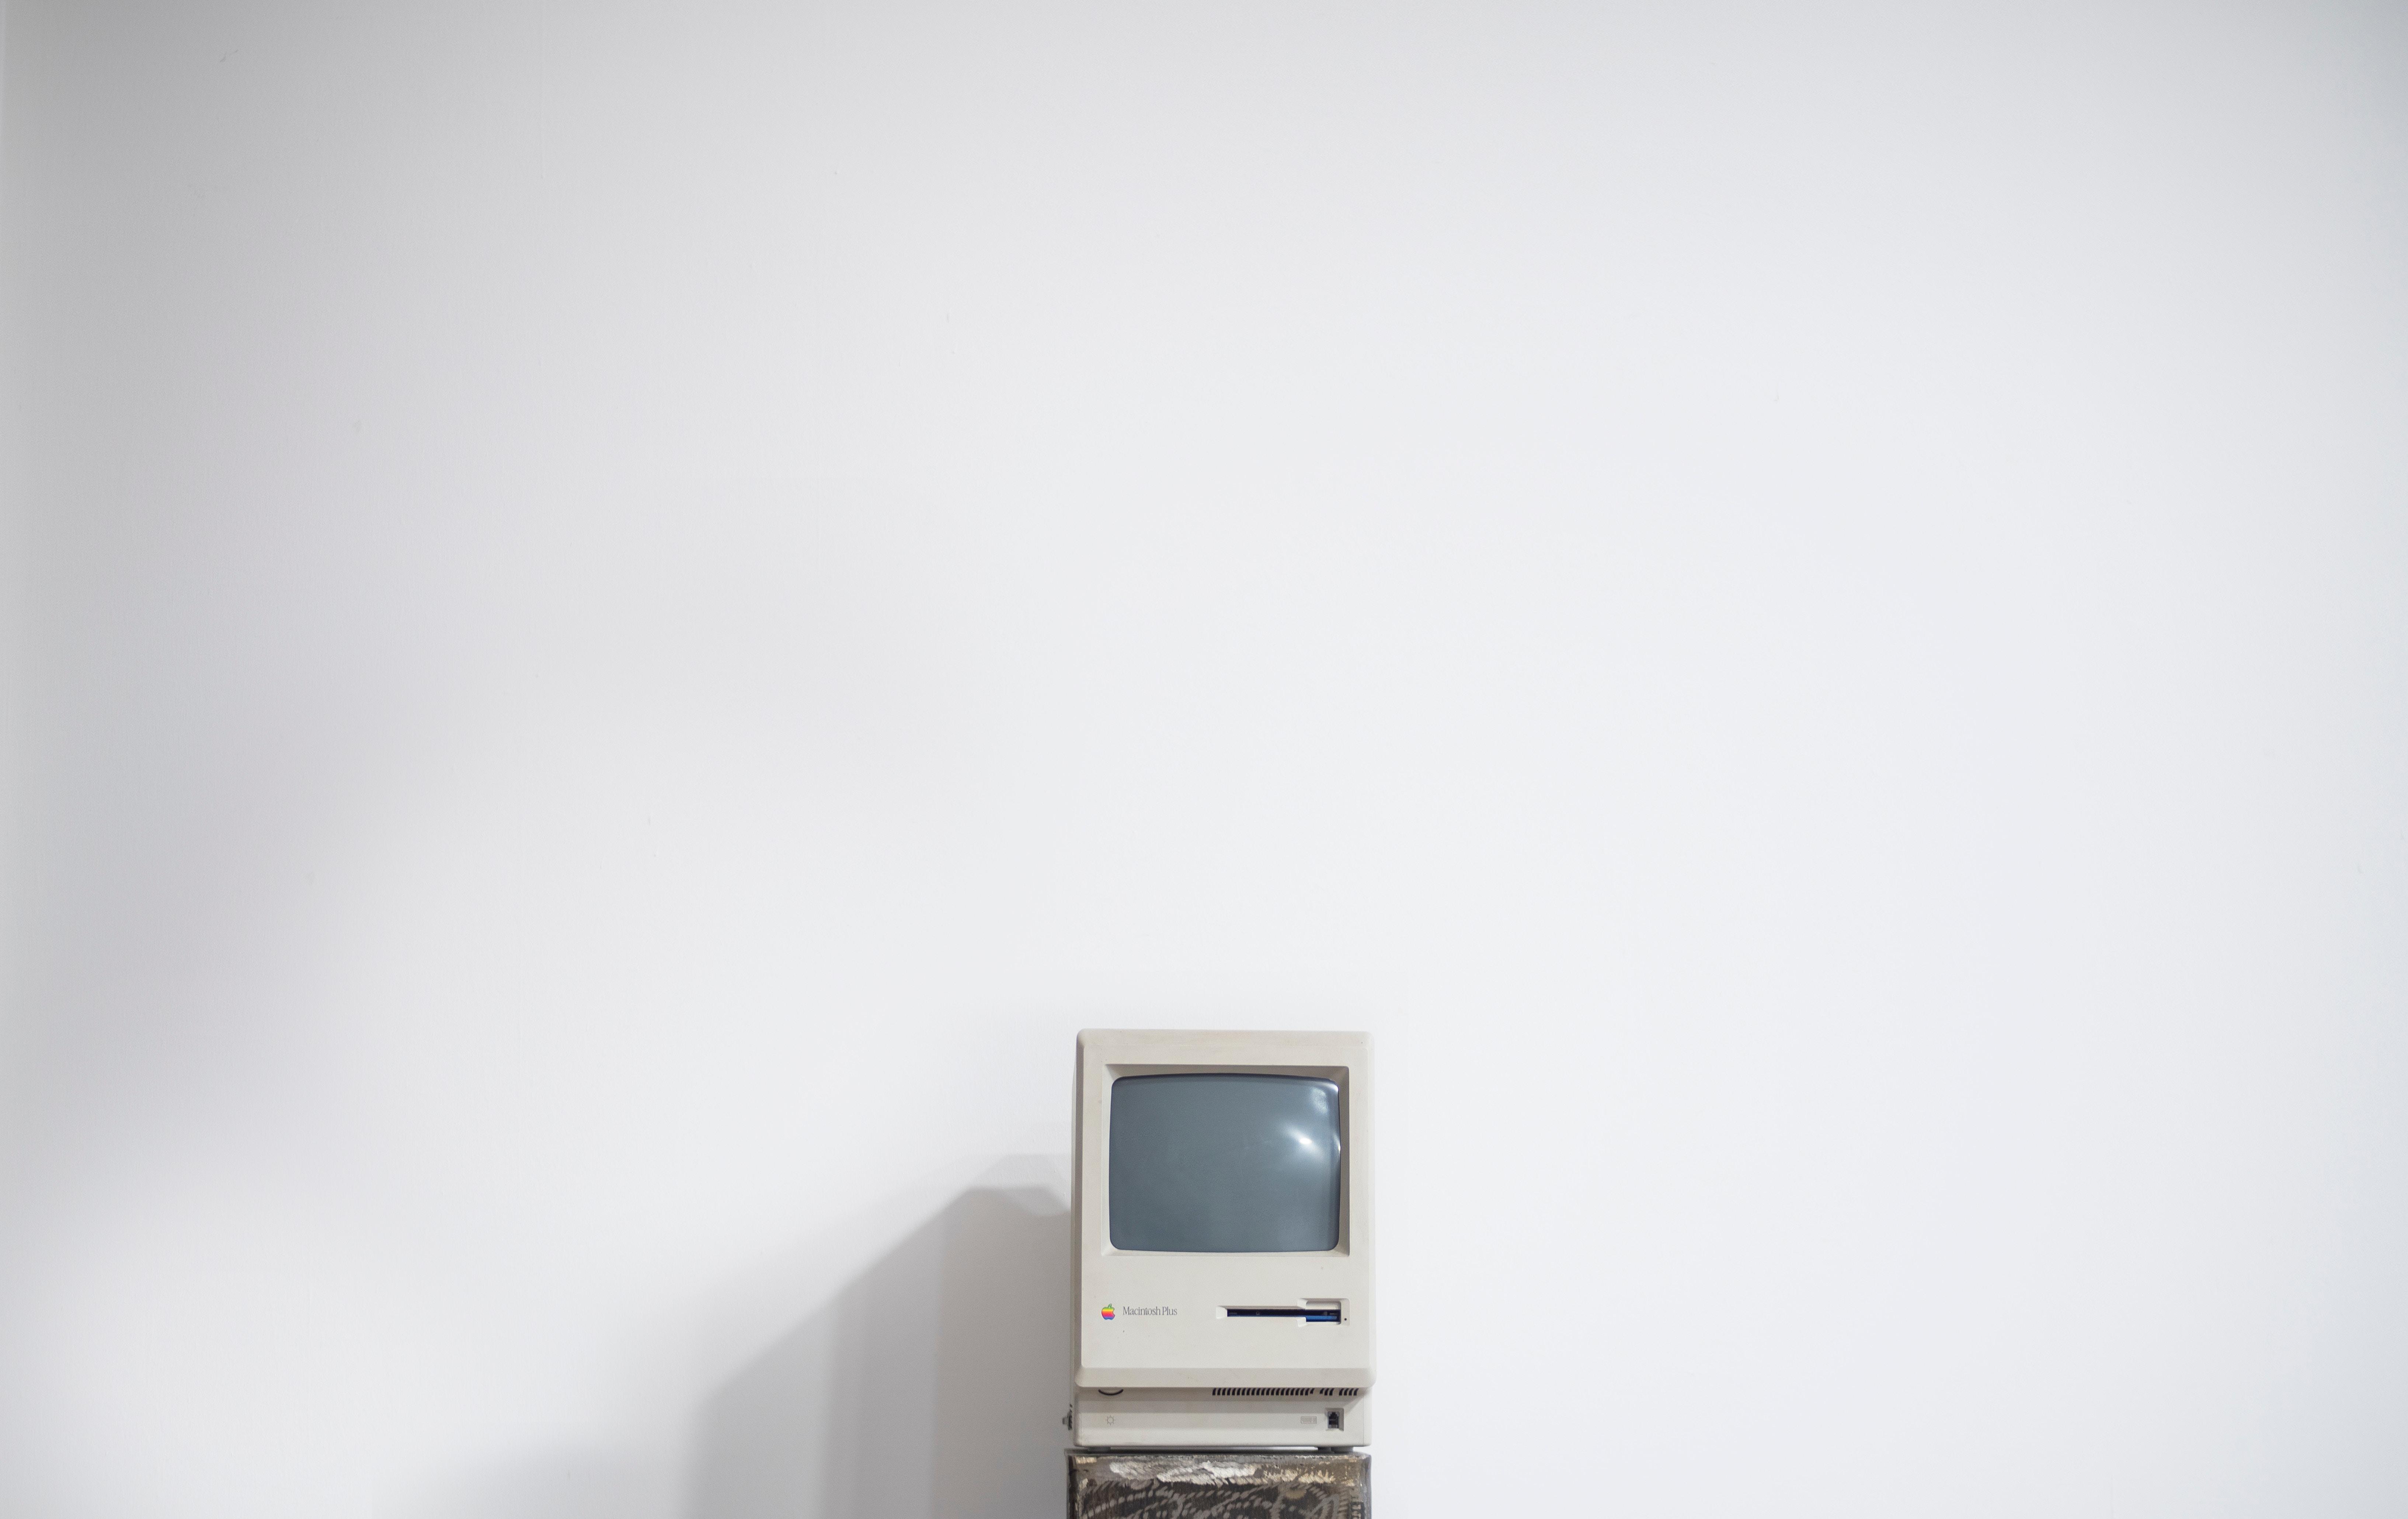 macintosh personal computer